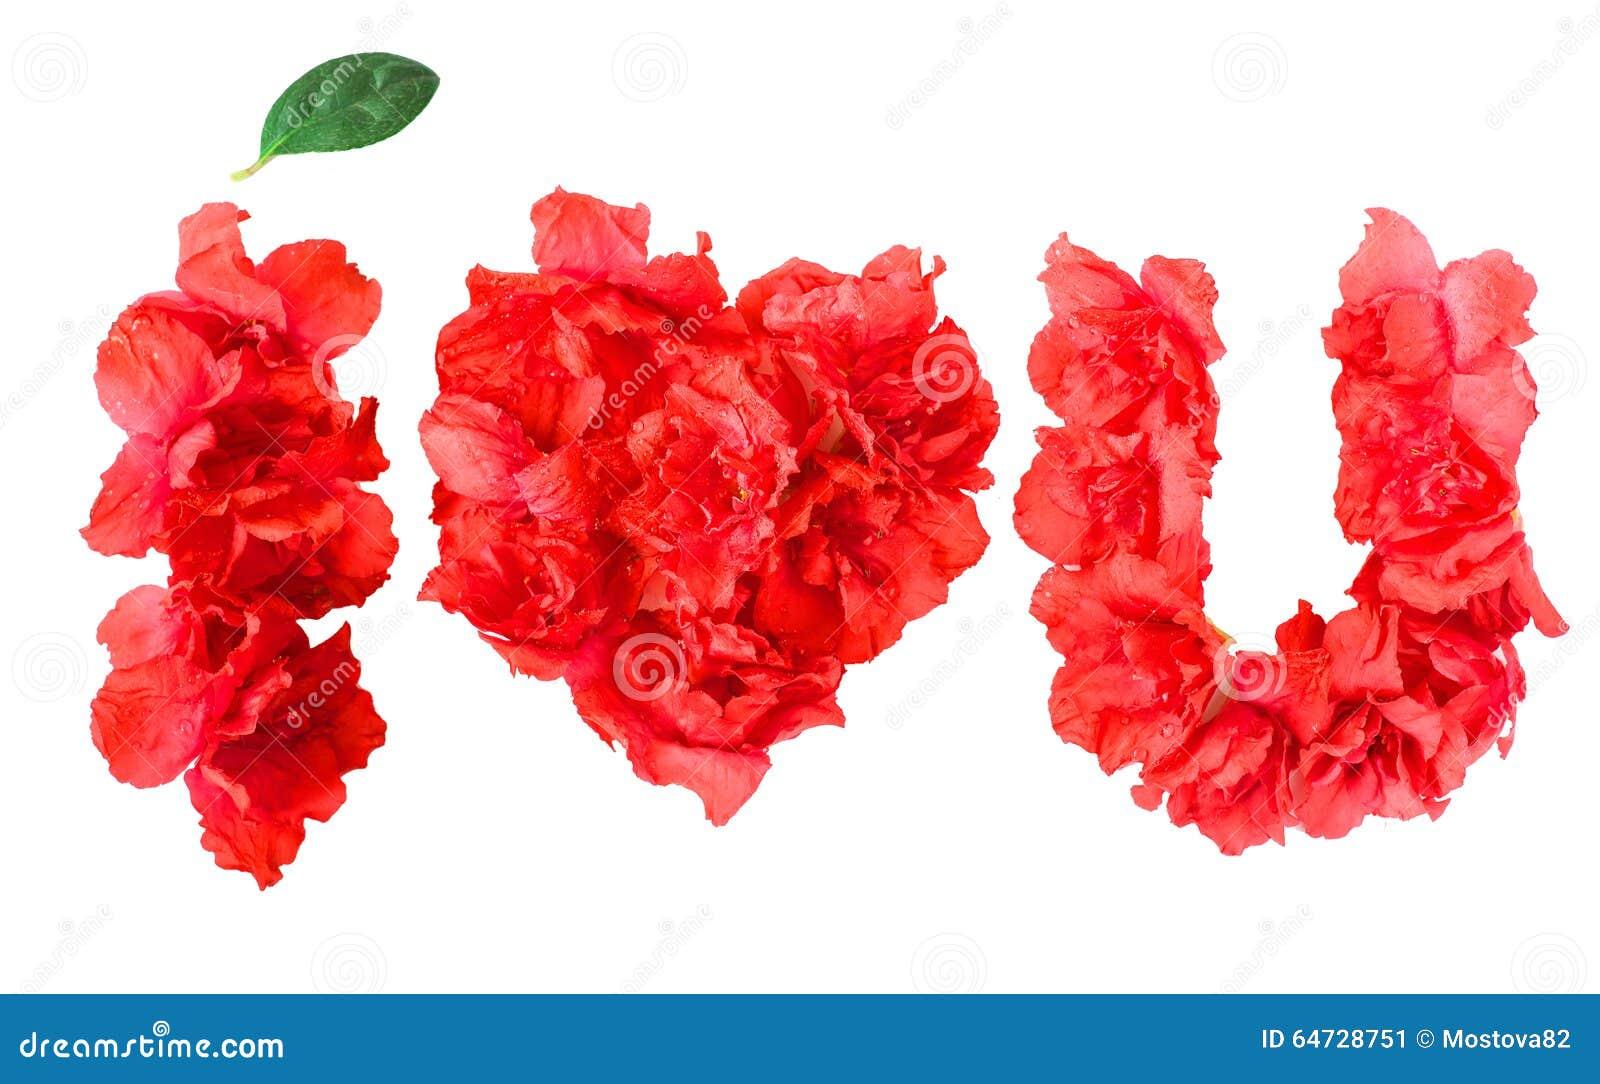 Pattern Of Red Azalea Flowers In Form I LOVE YOU